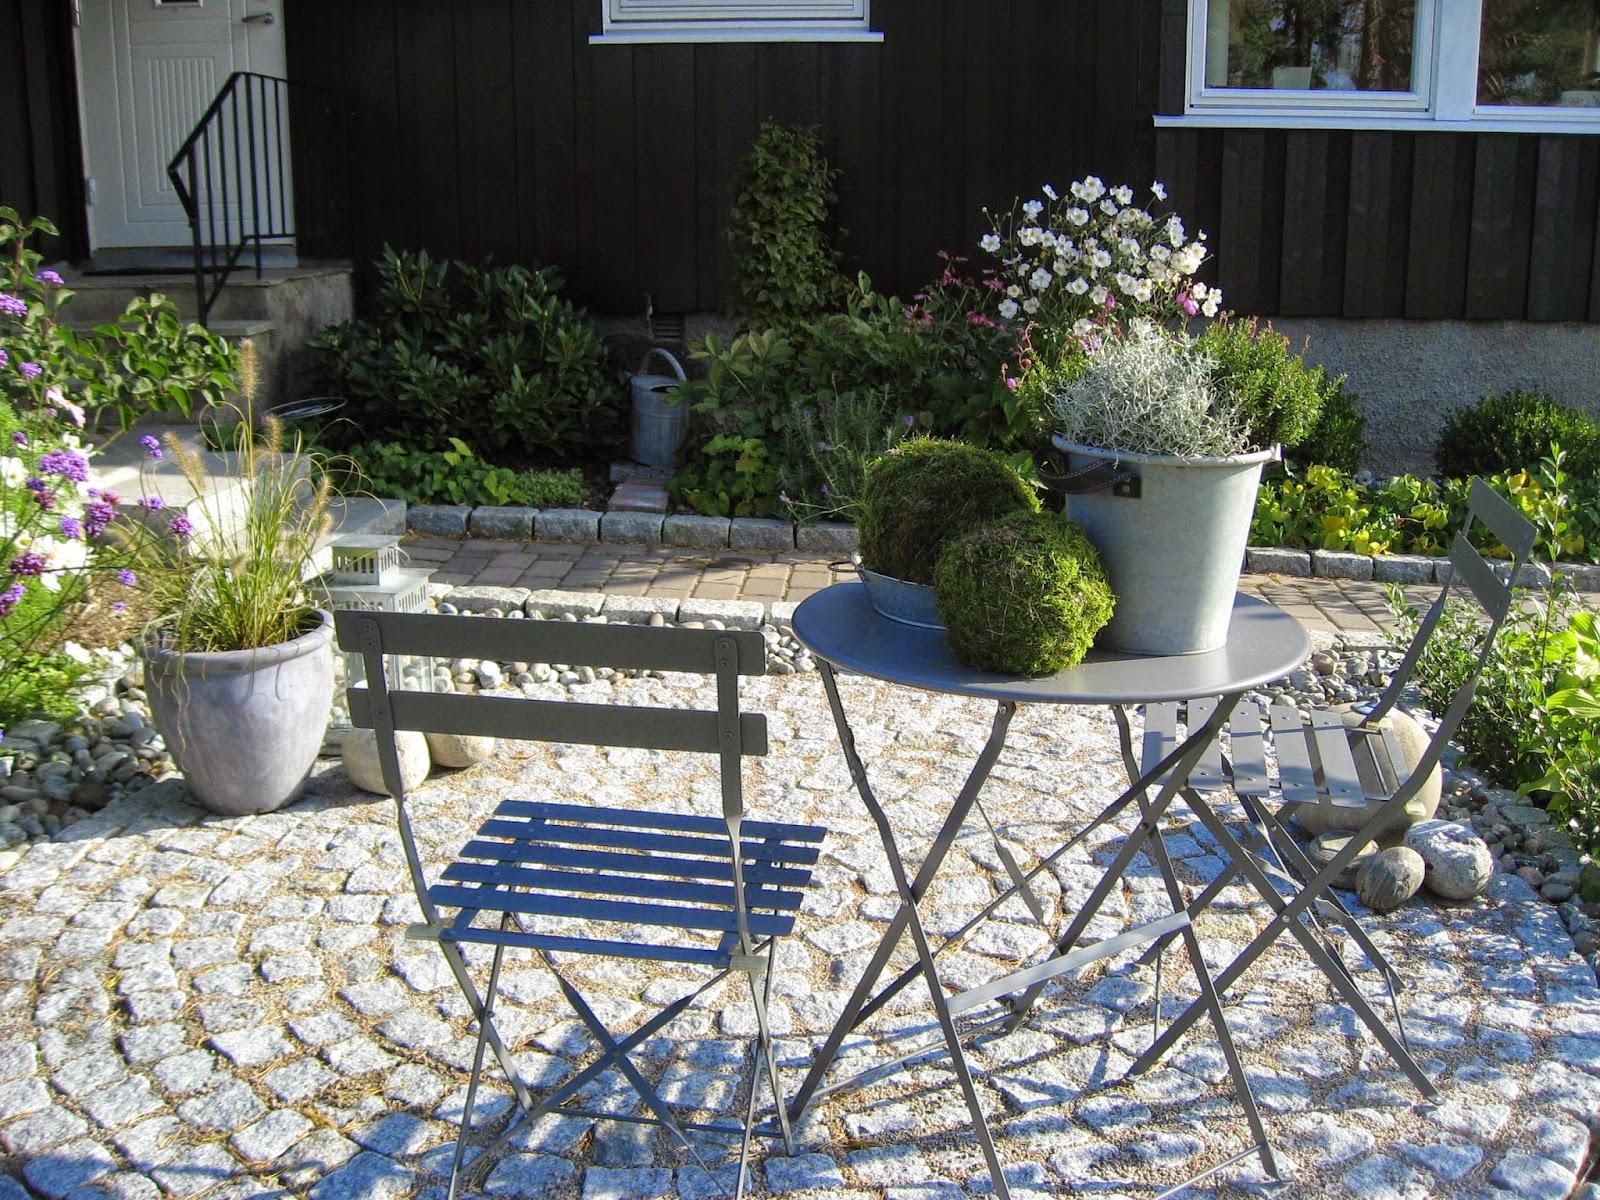 Tips til hvordan du lager mosekuler. Stilleben på et bord med mosekuler og høstkrukker. Furulunden.